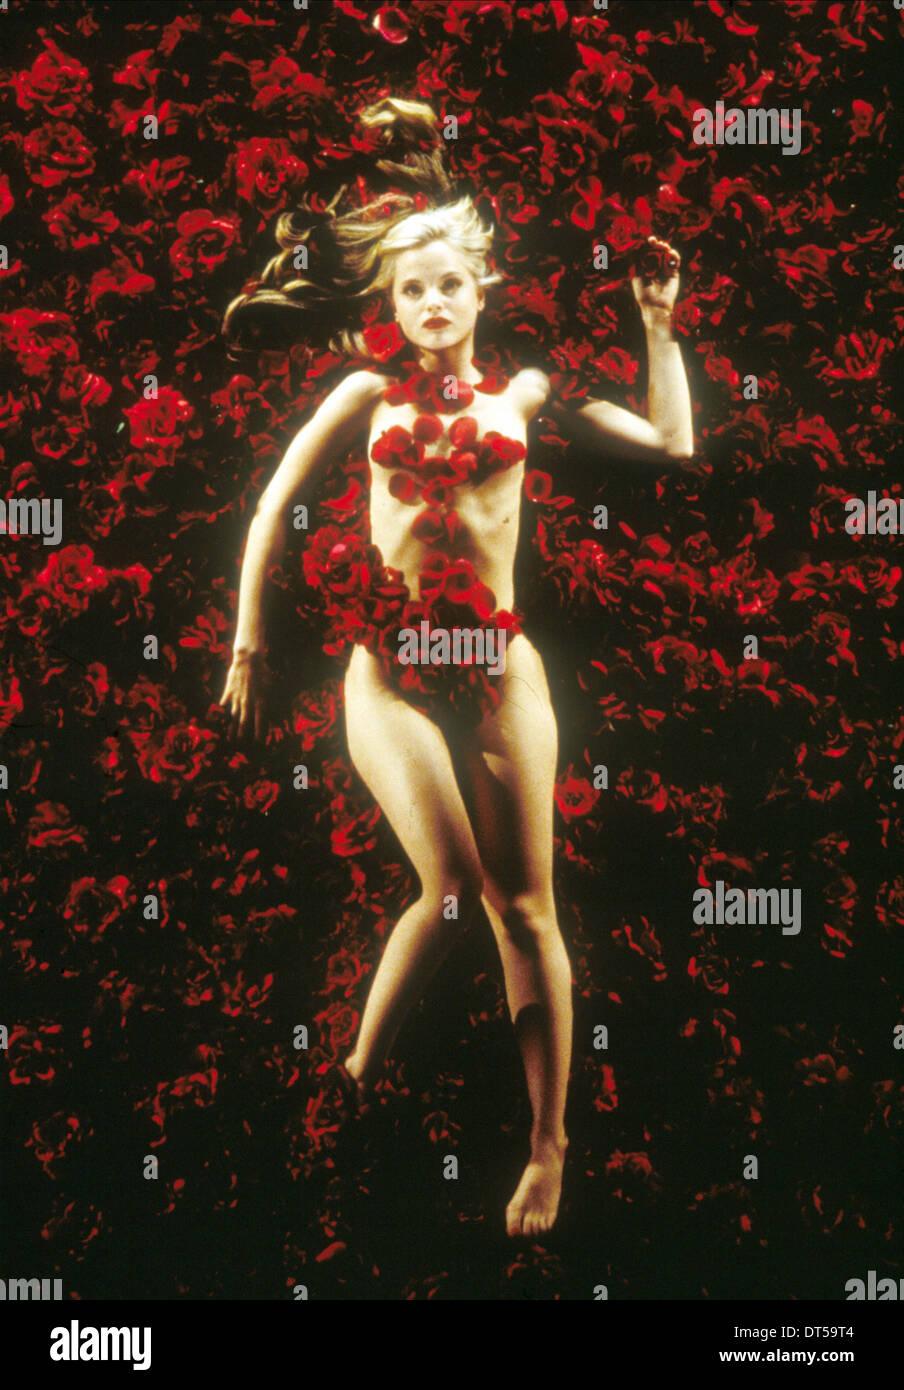 Mena Suvari American Beauty 1999 Stock Photo Alamy